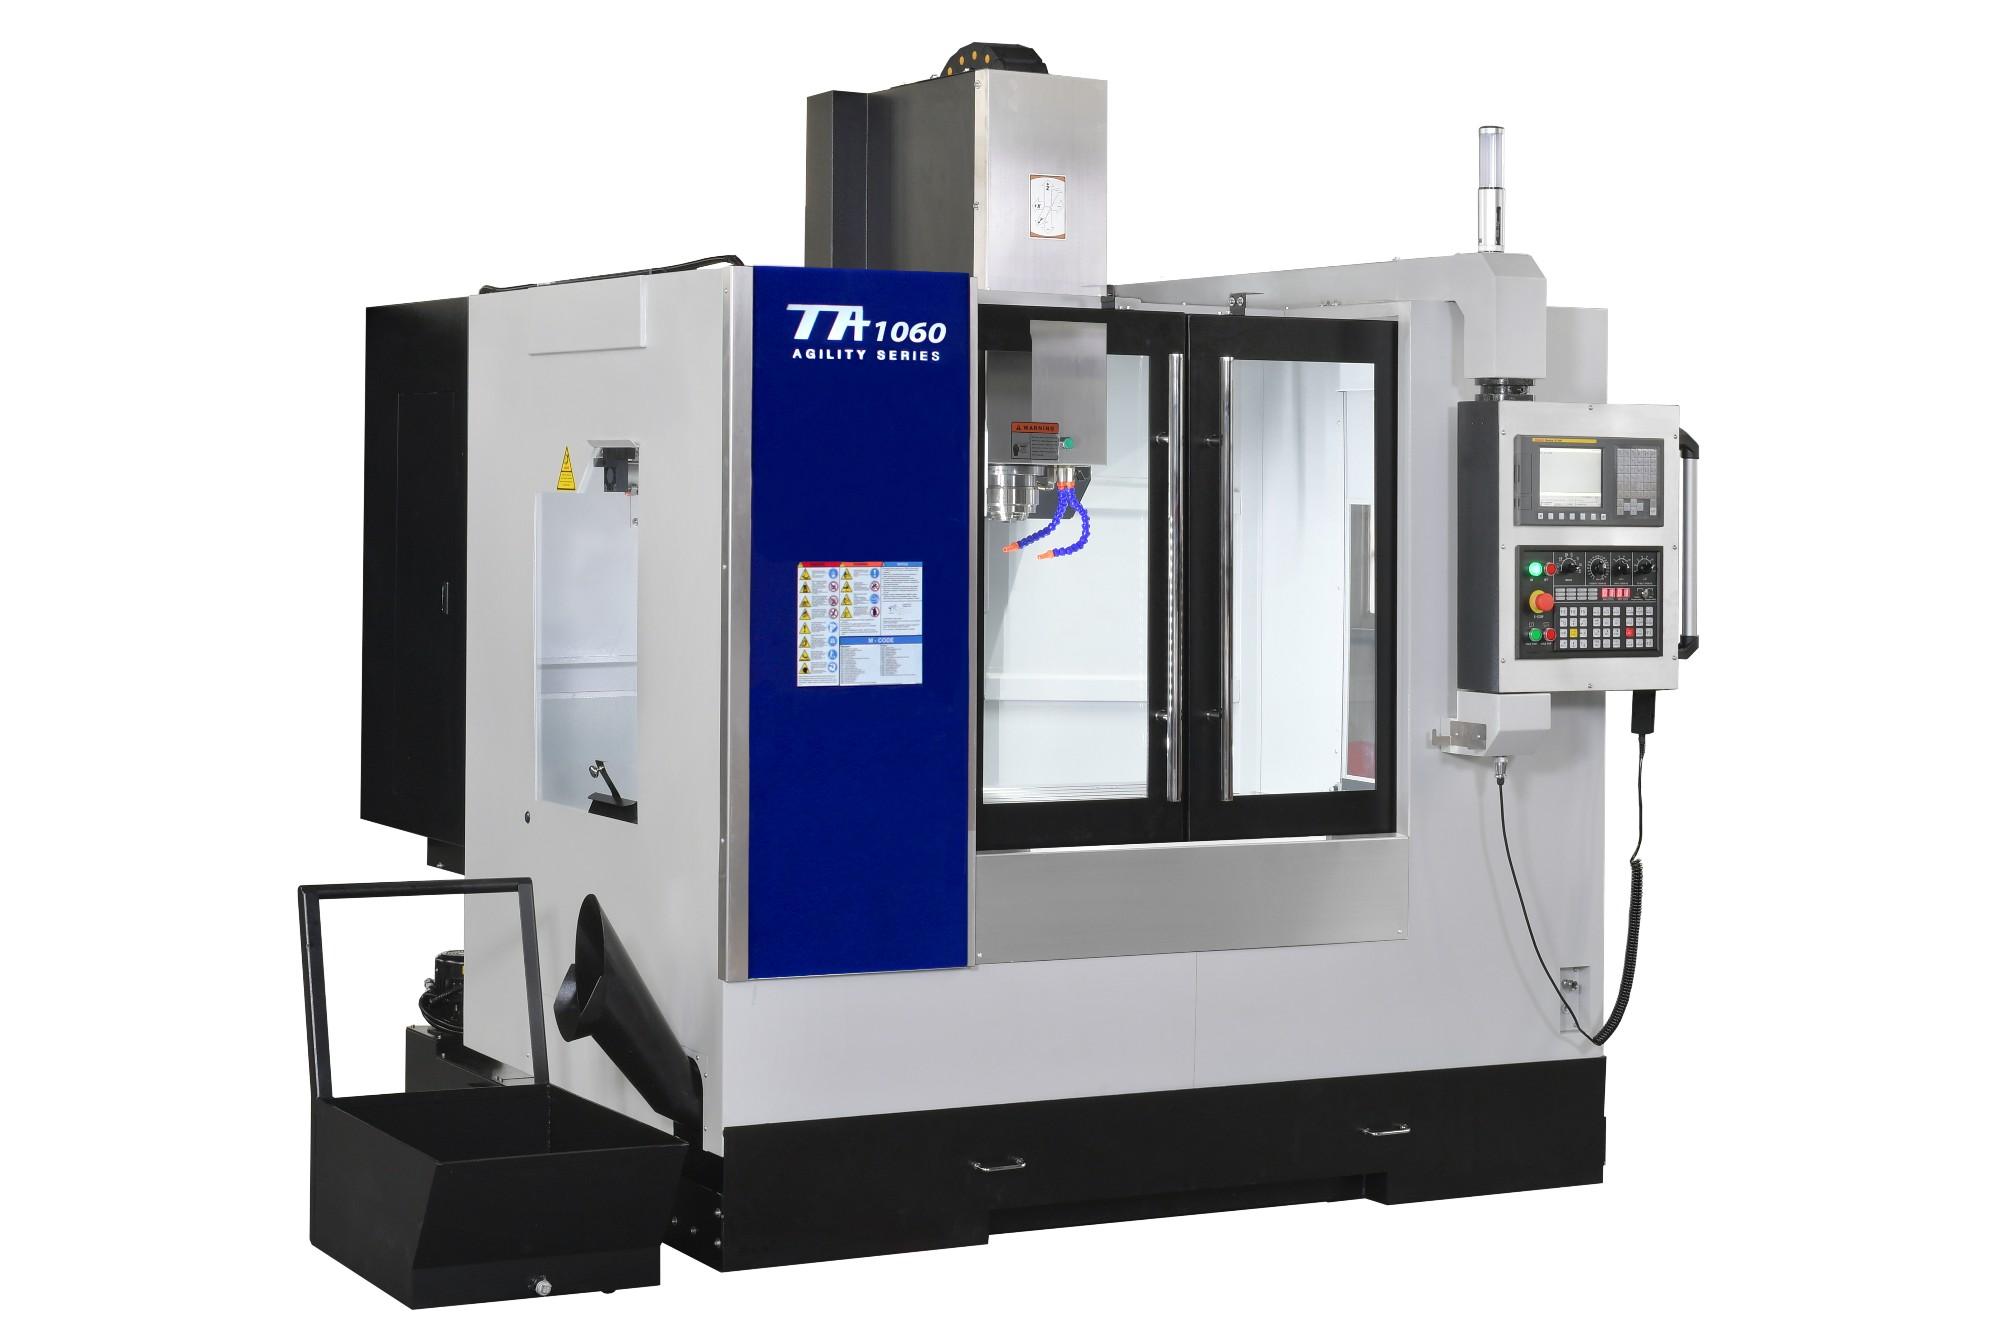 TA-1060 Entry Customizable Cnc Vertical Machine Center